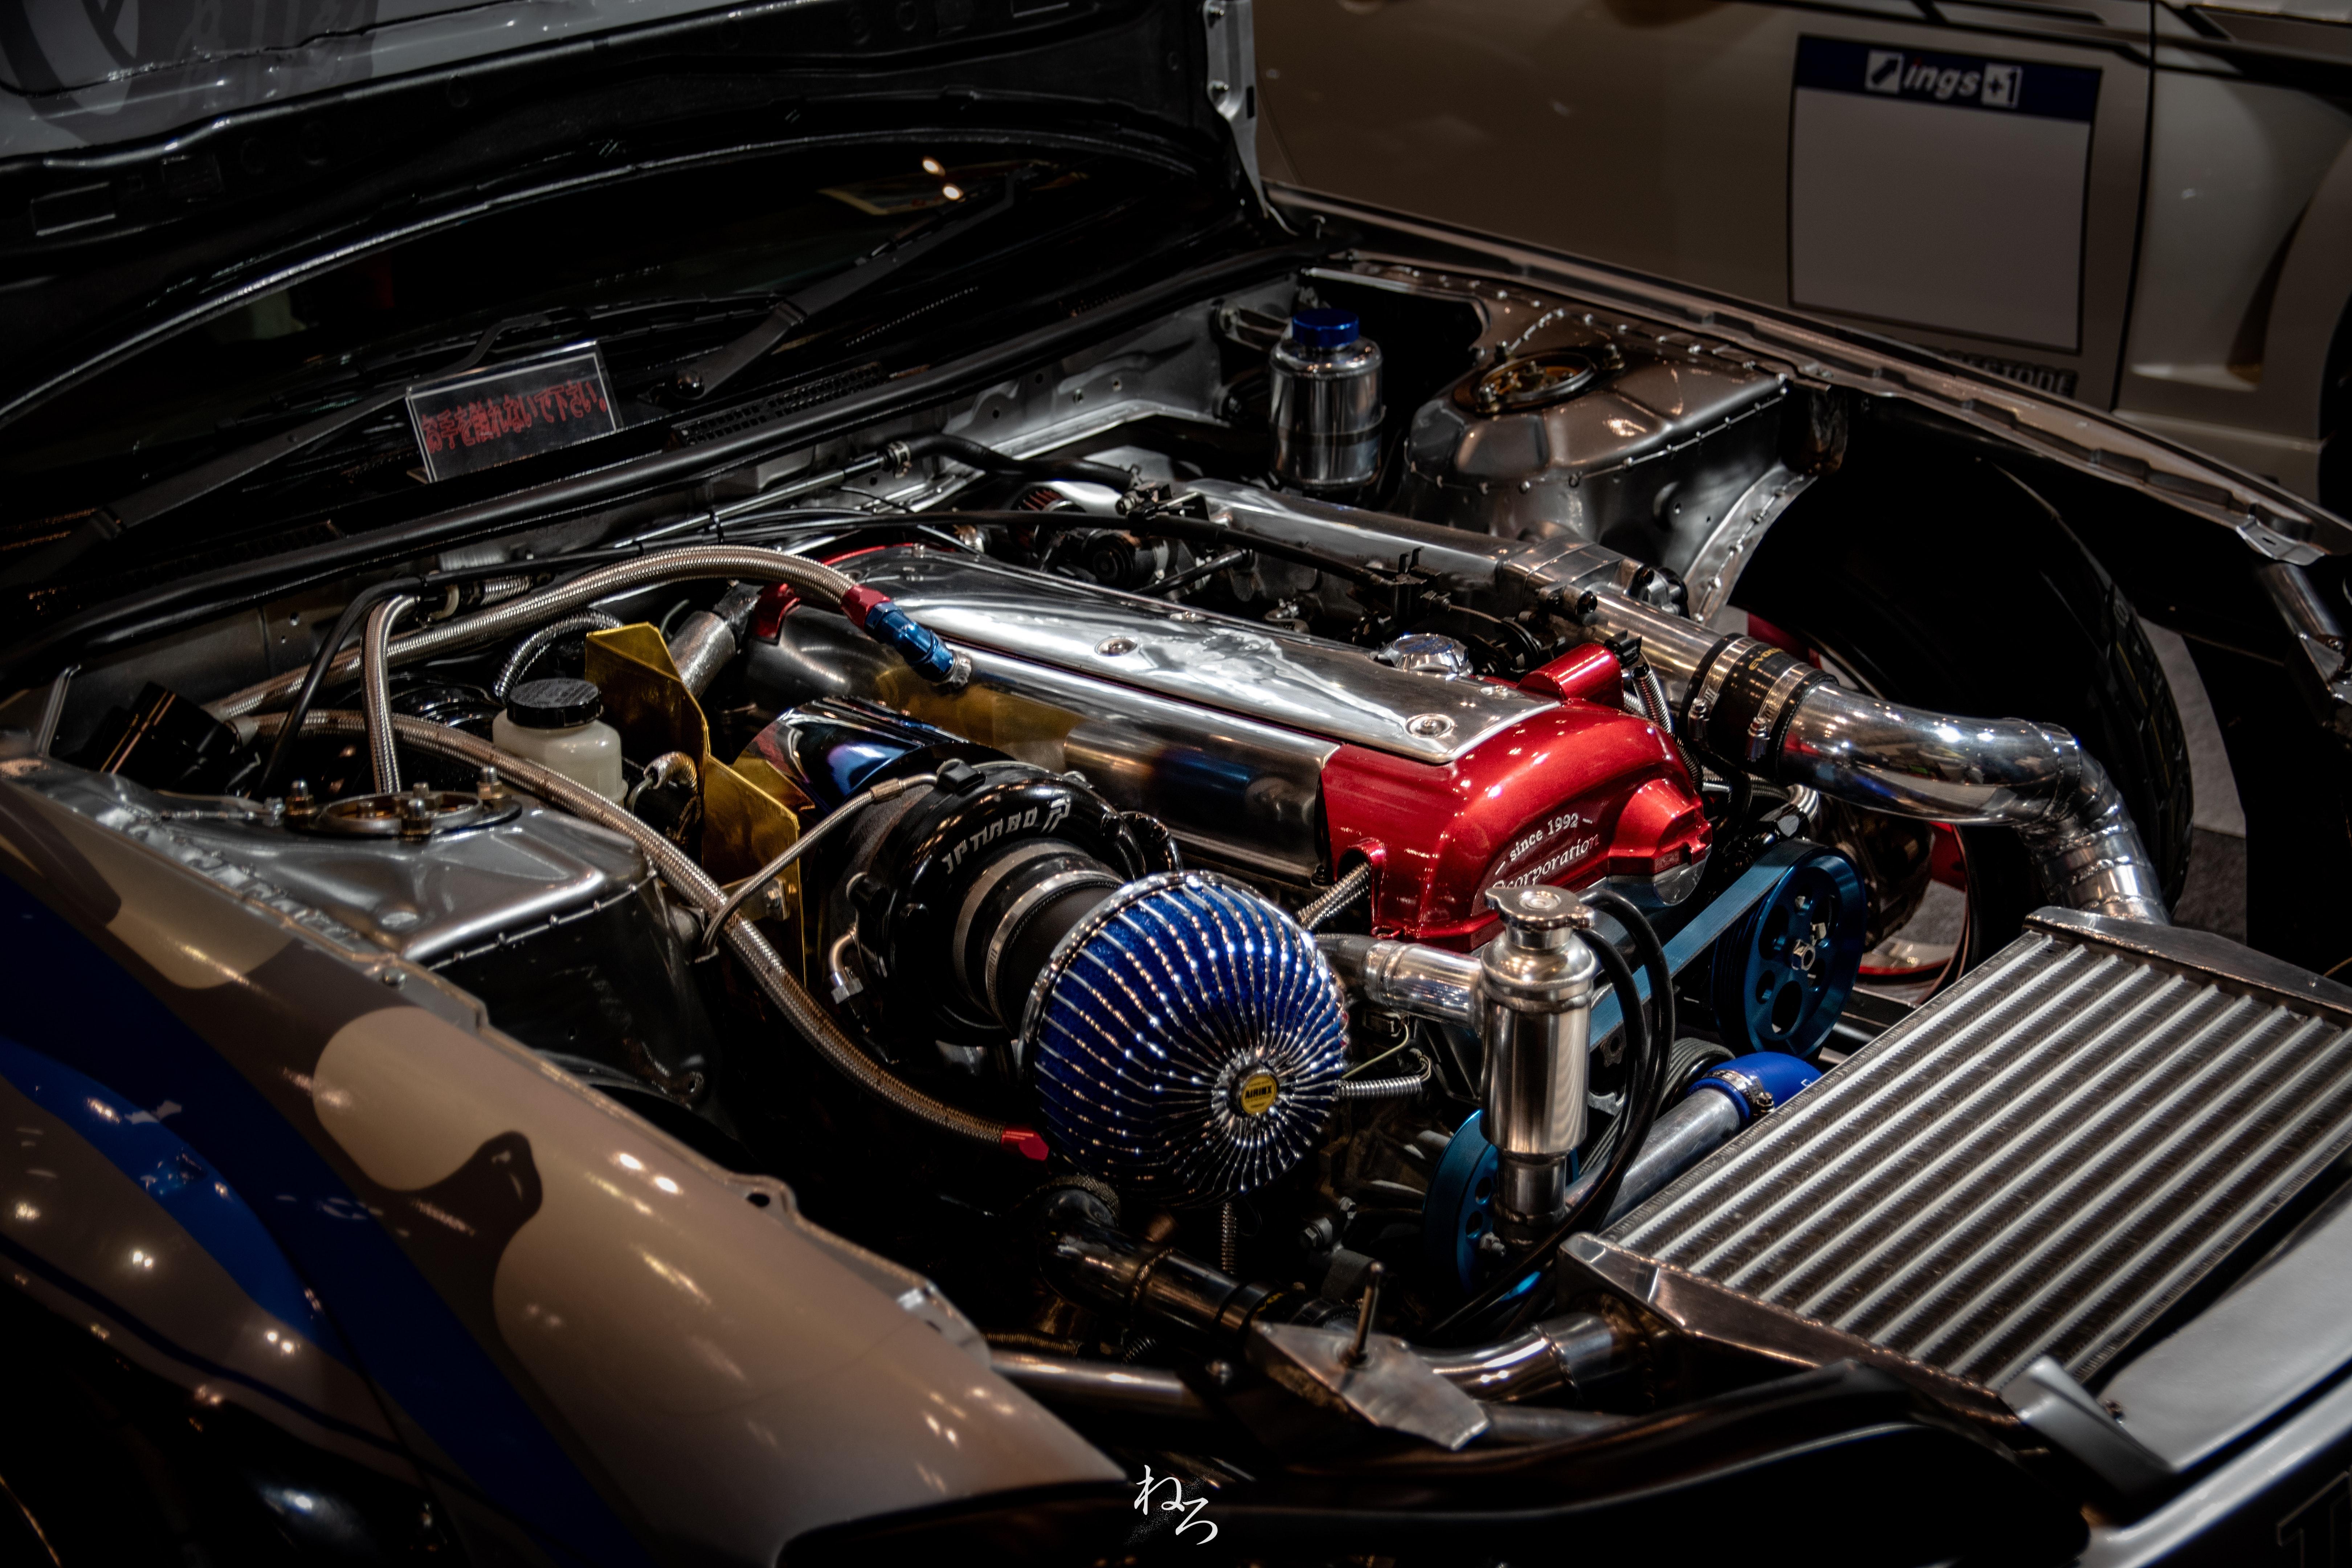 Free stock photo of automotive, car engine